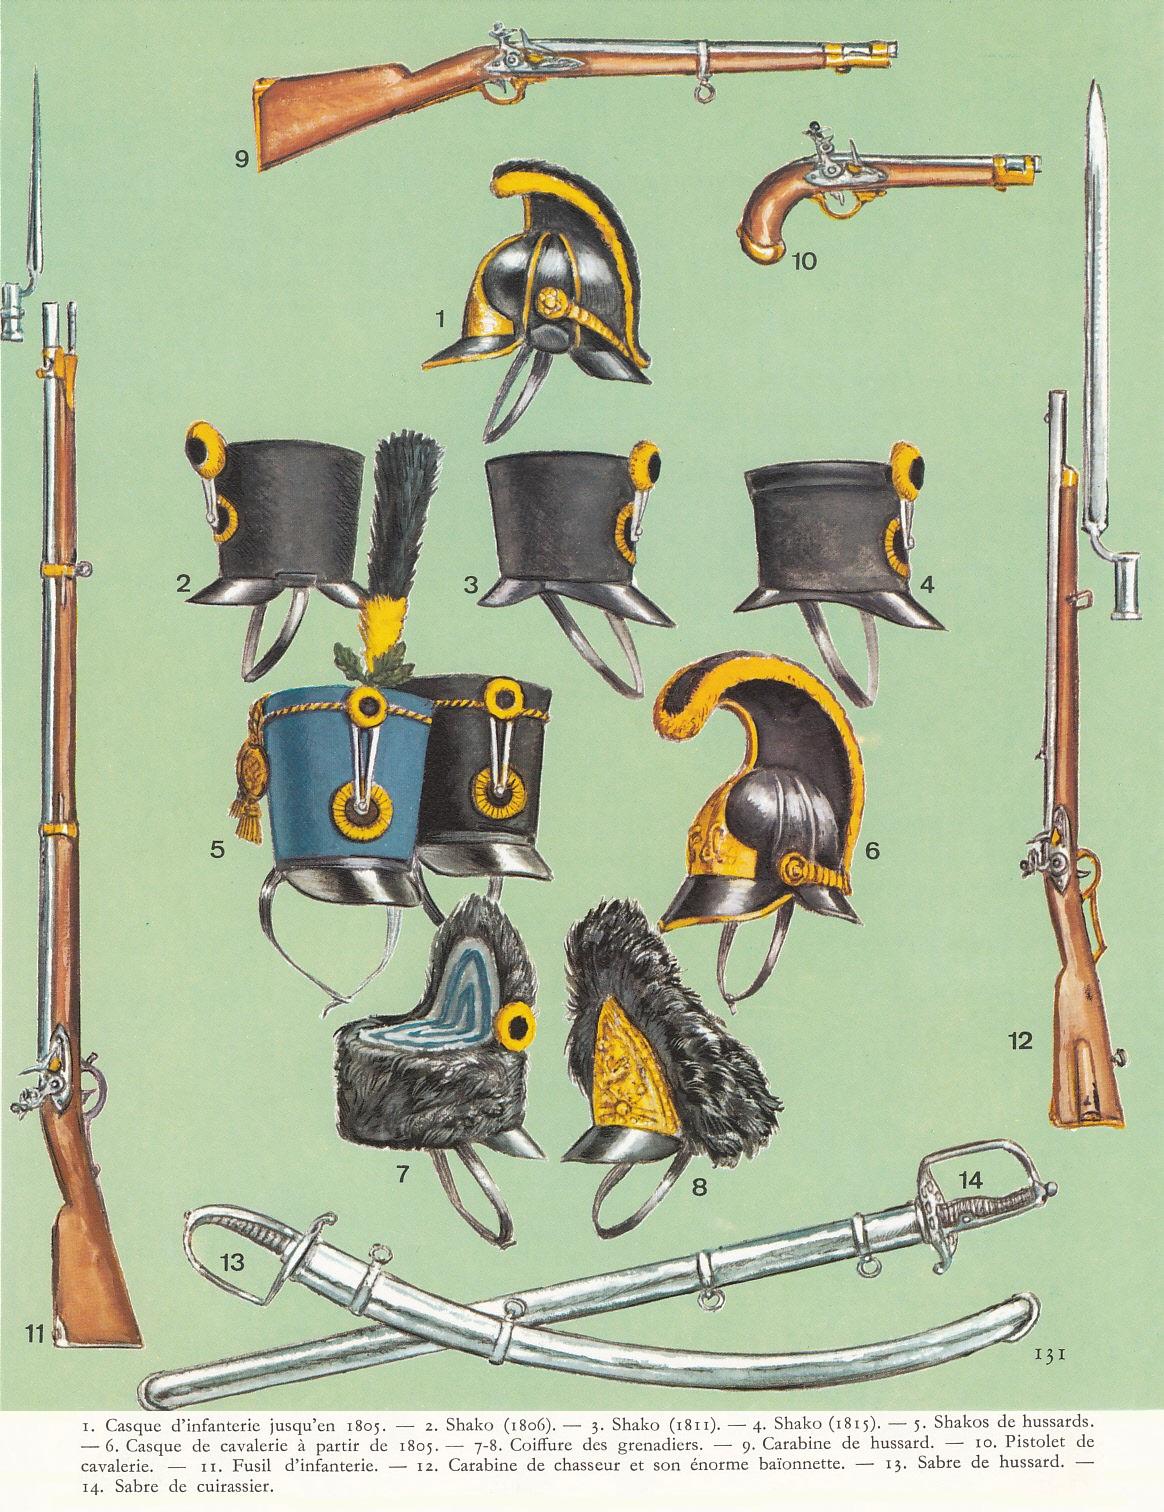 Autriche 1er Empire : Armes et Coiffures 1523197996-casque-shako-hussard-grenadier-autriche-1er-empire